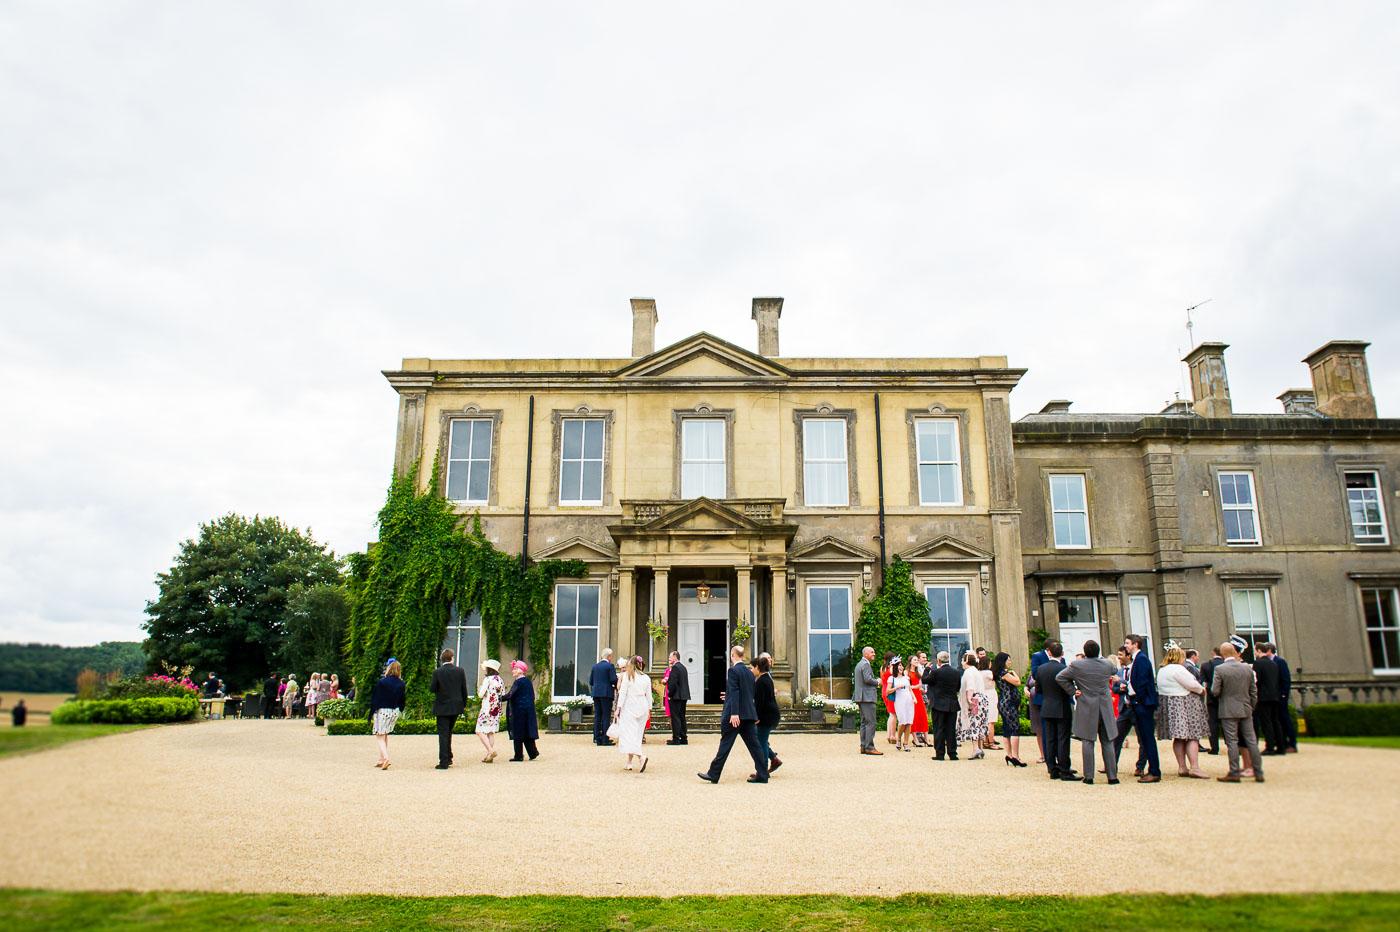 hothorpe-hall-wedding-photography-1011.jpg